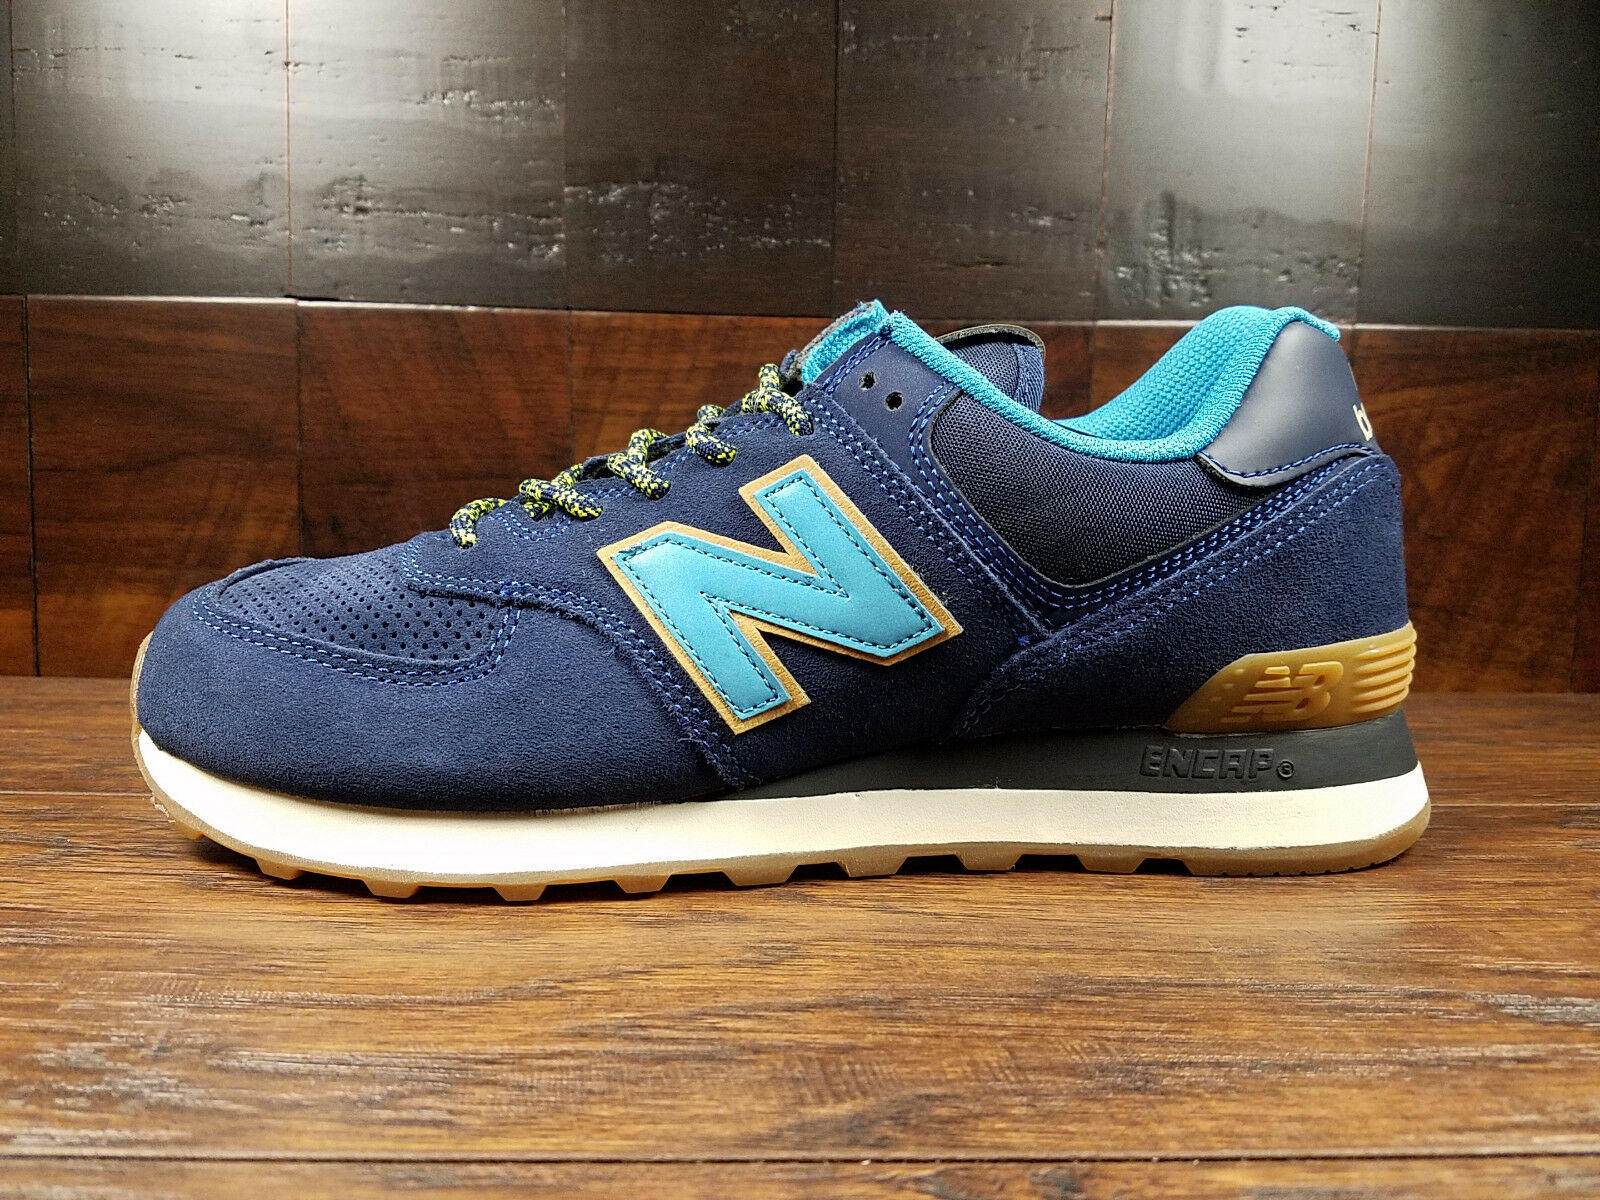 New Balance ML574OTA  Outdoor Pack  (Navy bluee   Light bluee) Suede 574 Mens 8-12